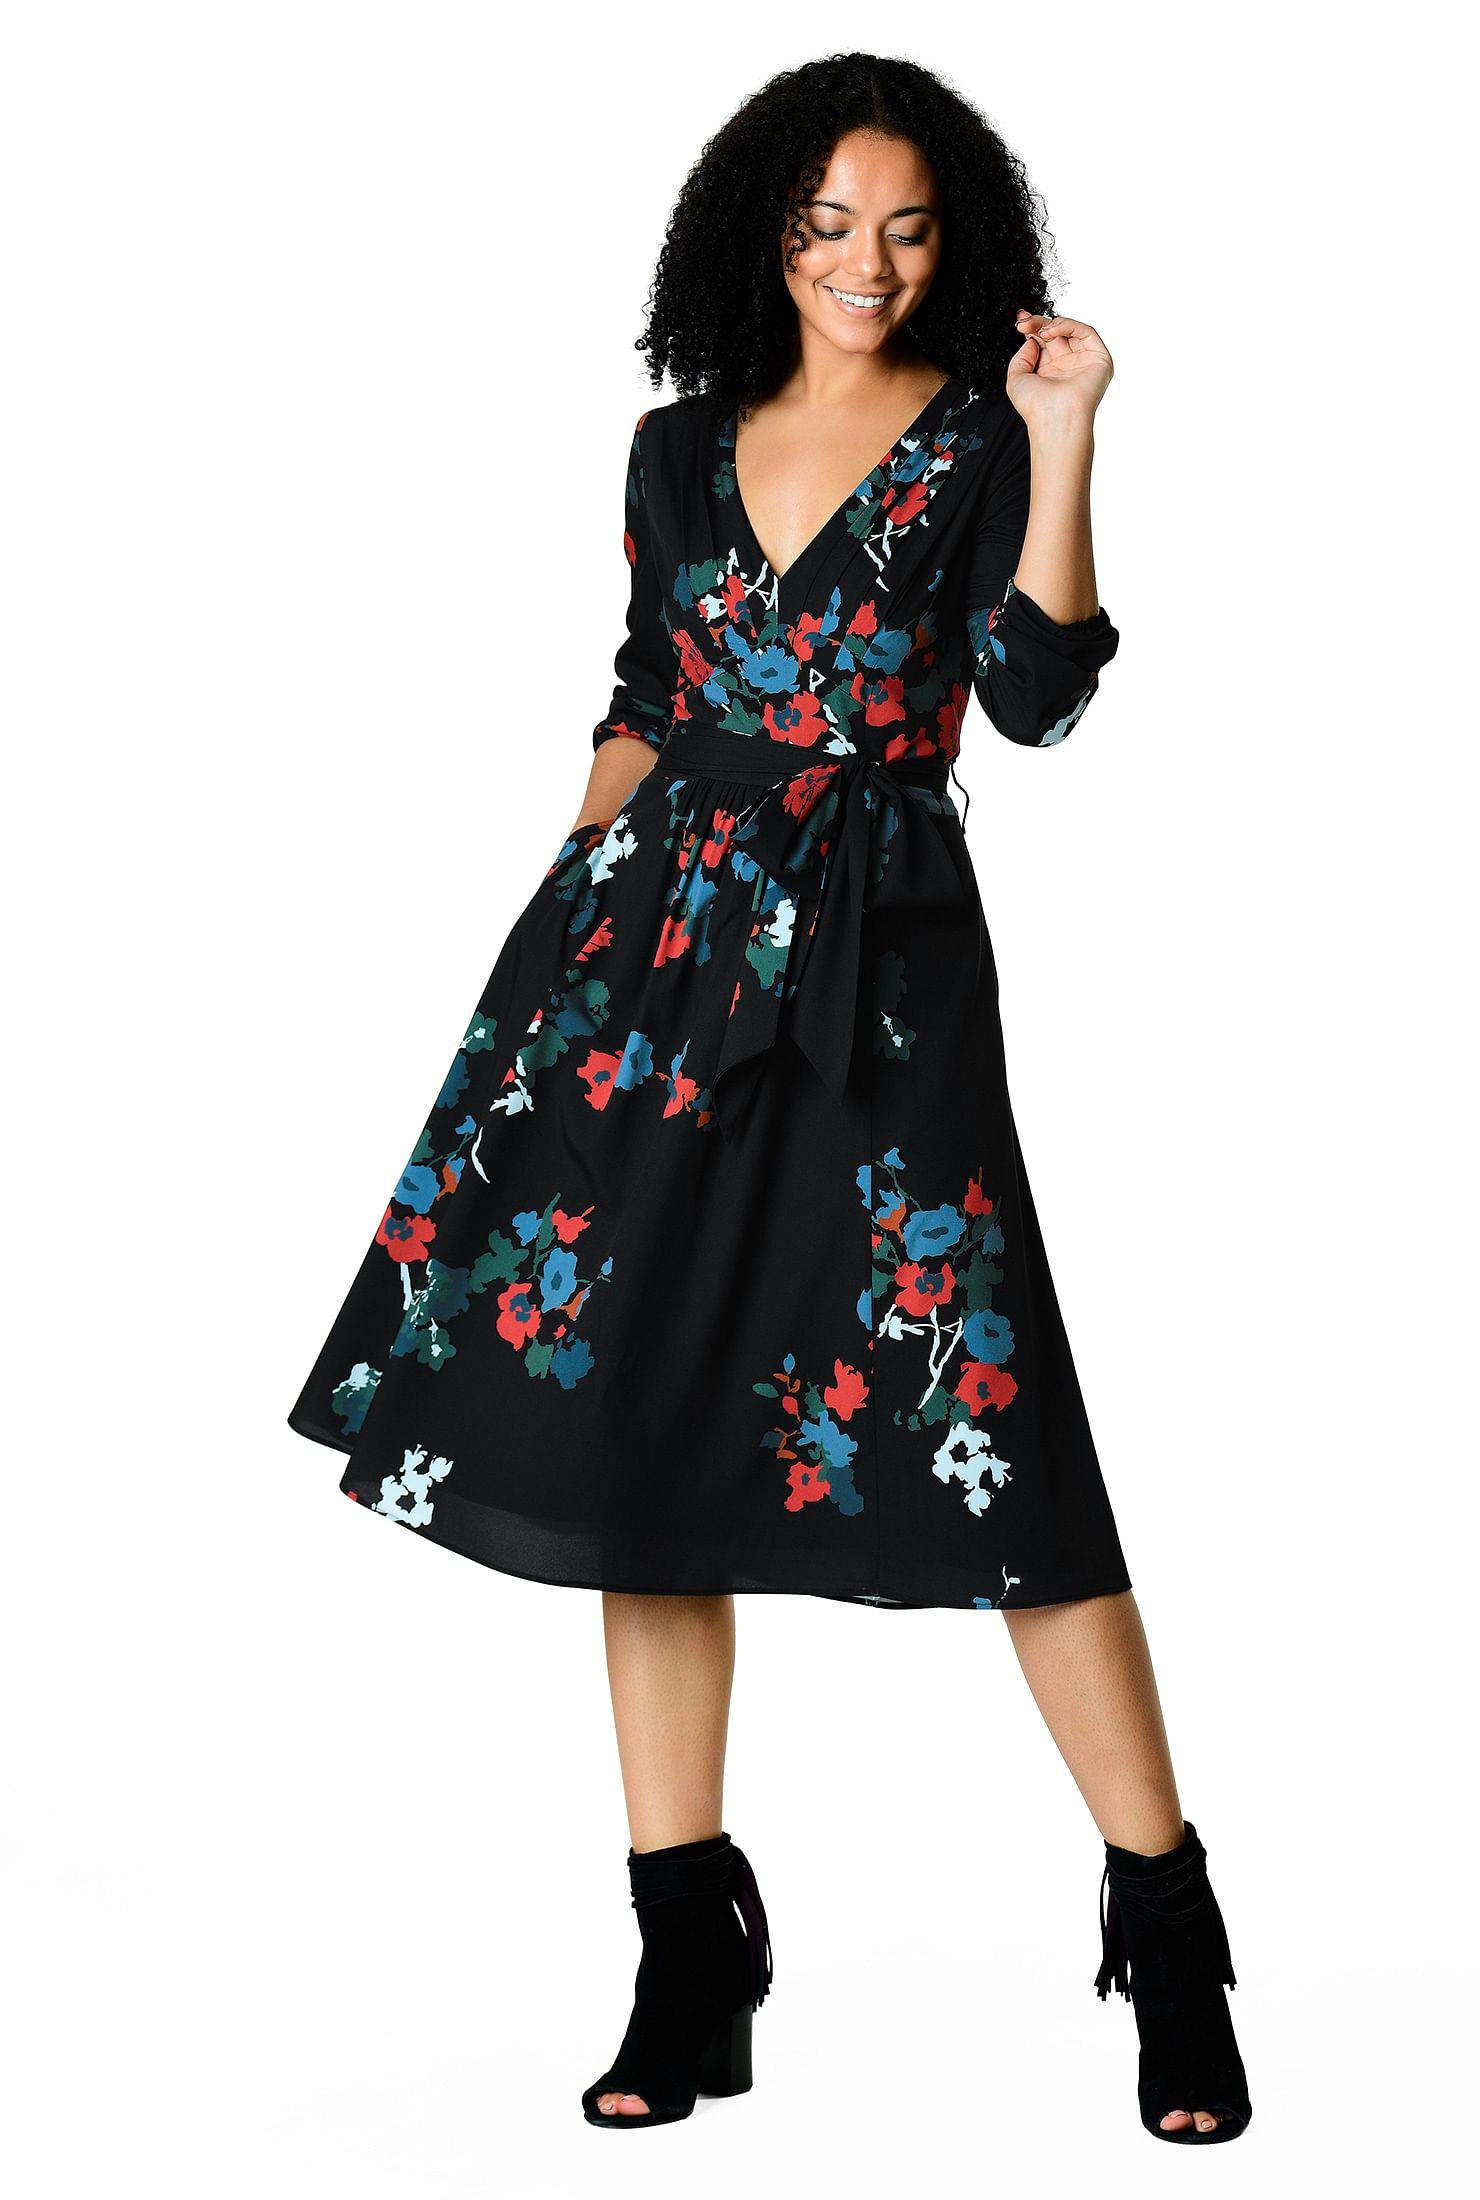 e0880999712 Black Floral Midi Dress Long Sleeve